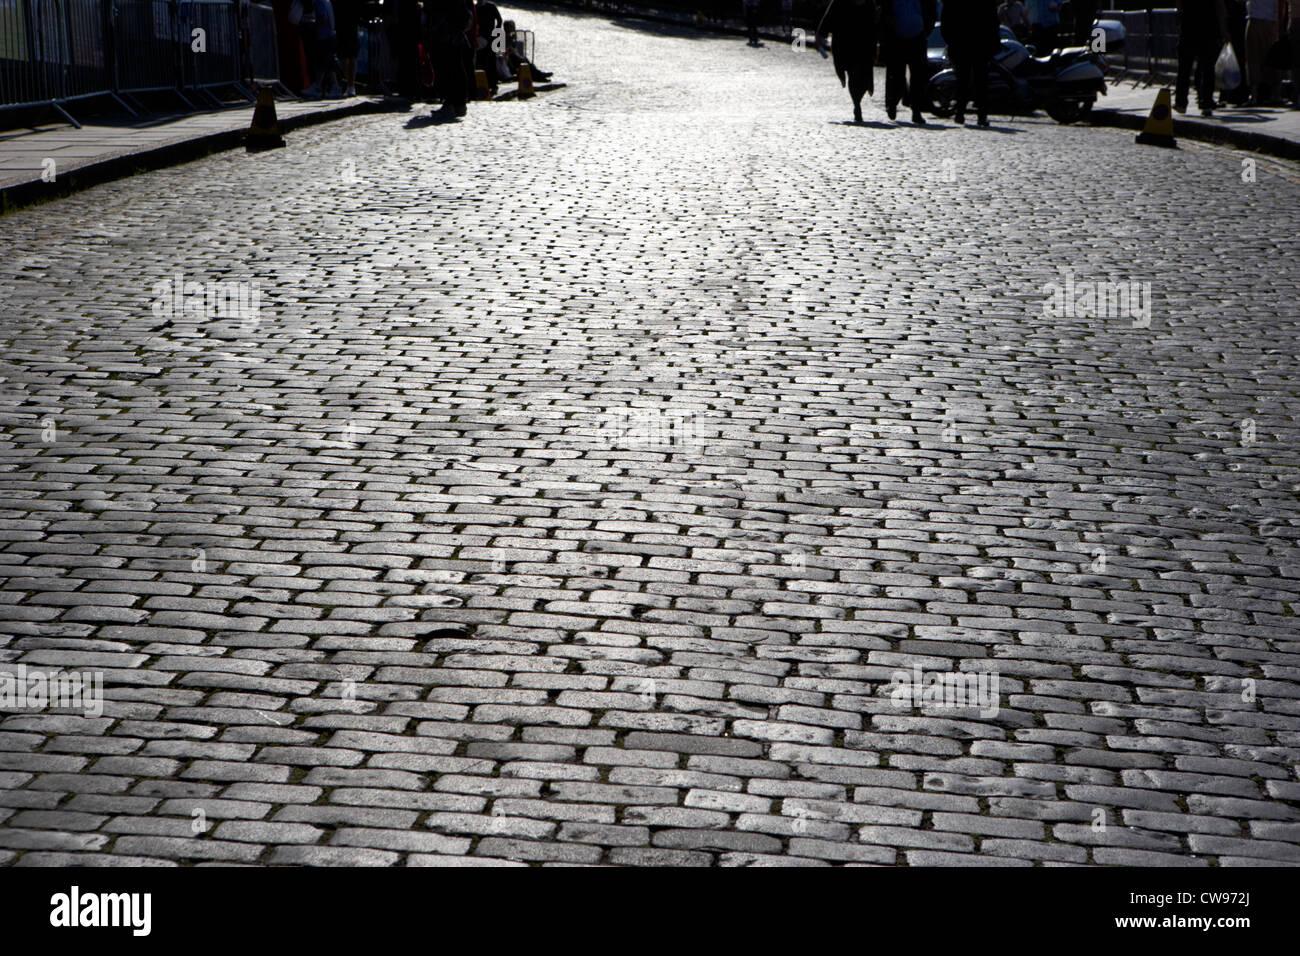 cobblestoned street on the royal mile edinburgh scotland uk united kingdom - Stock Image